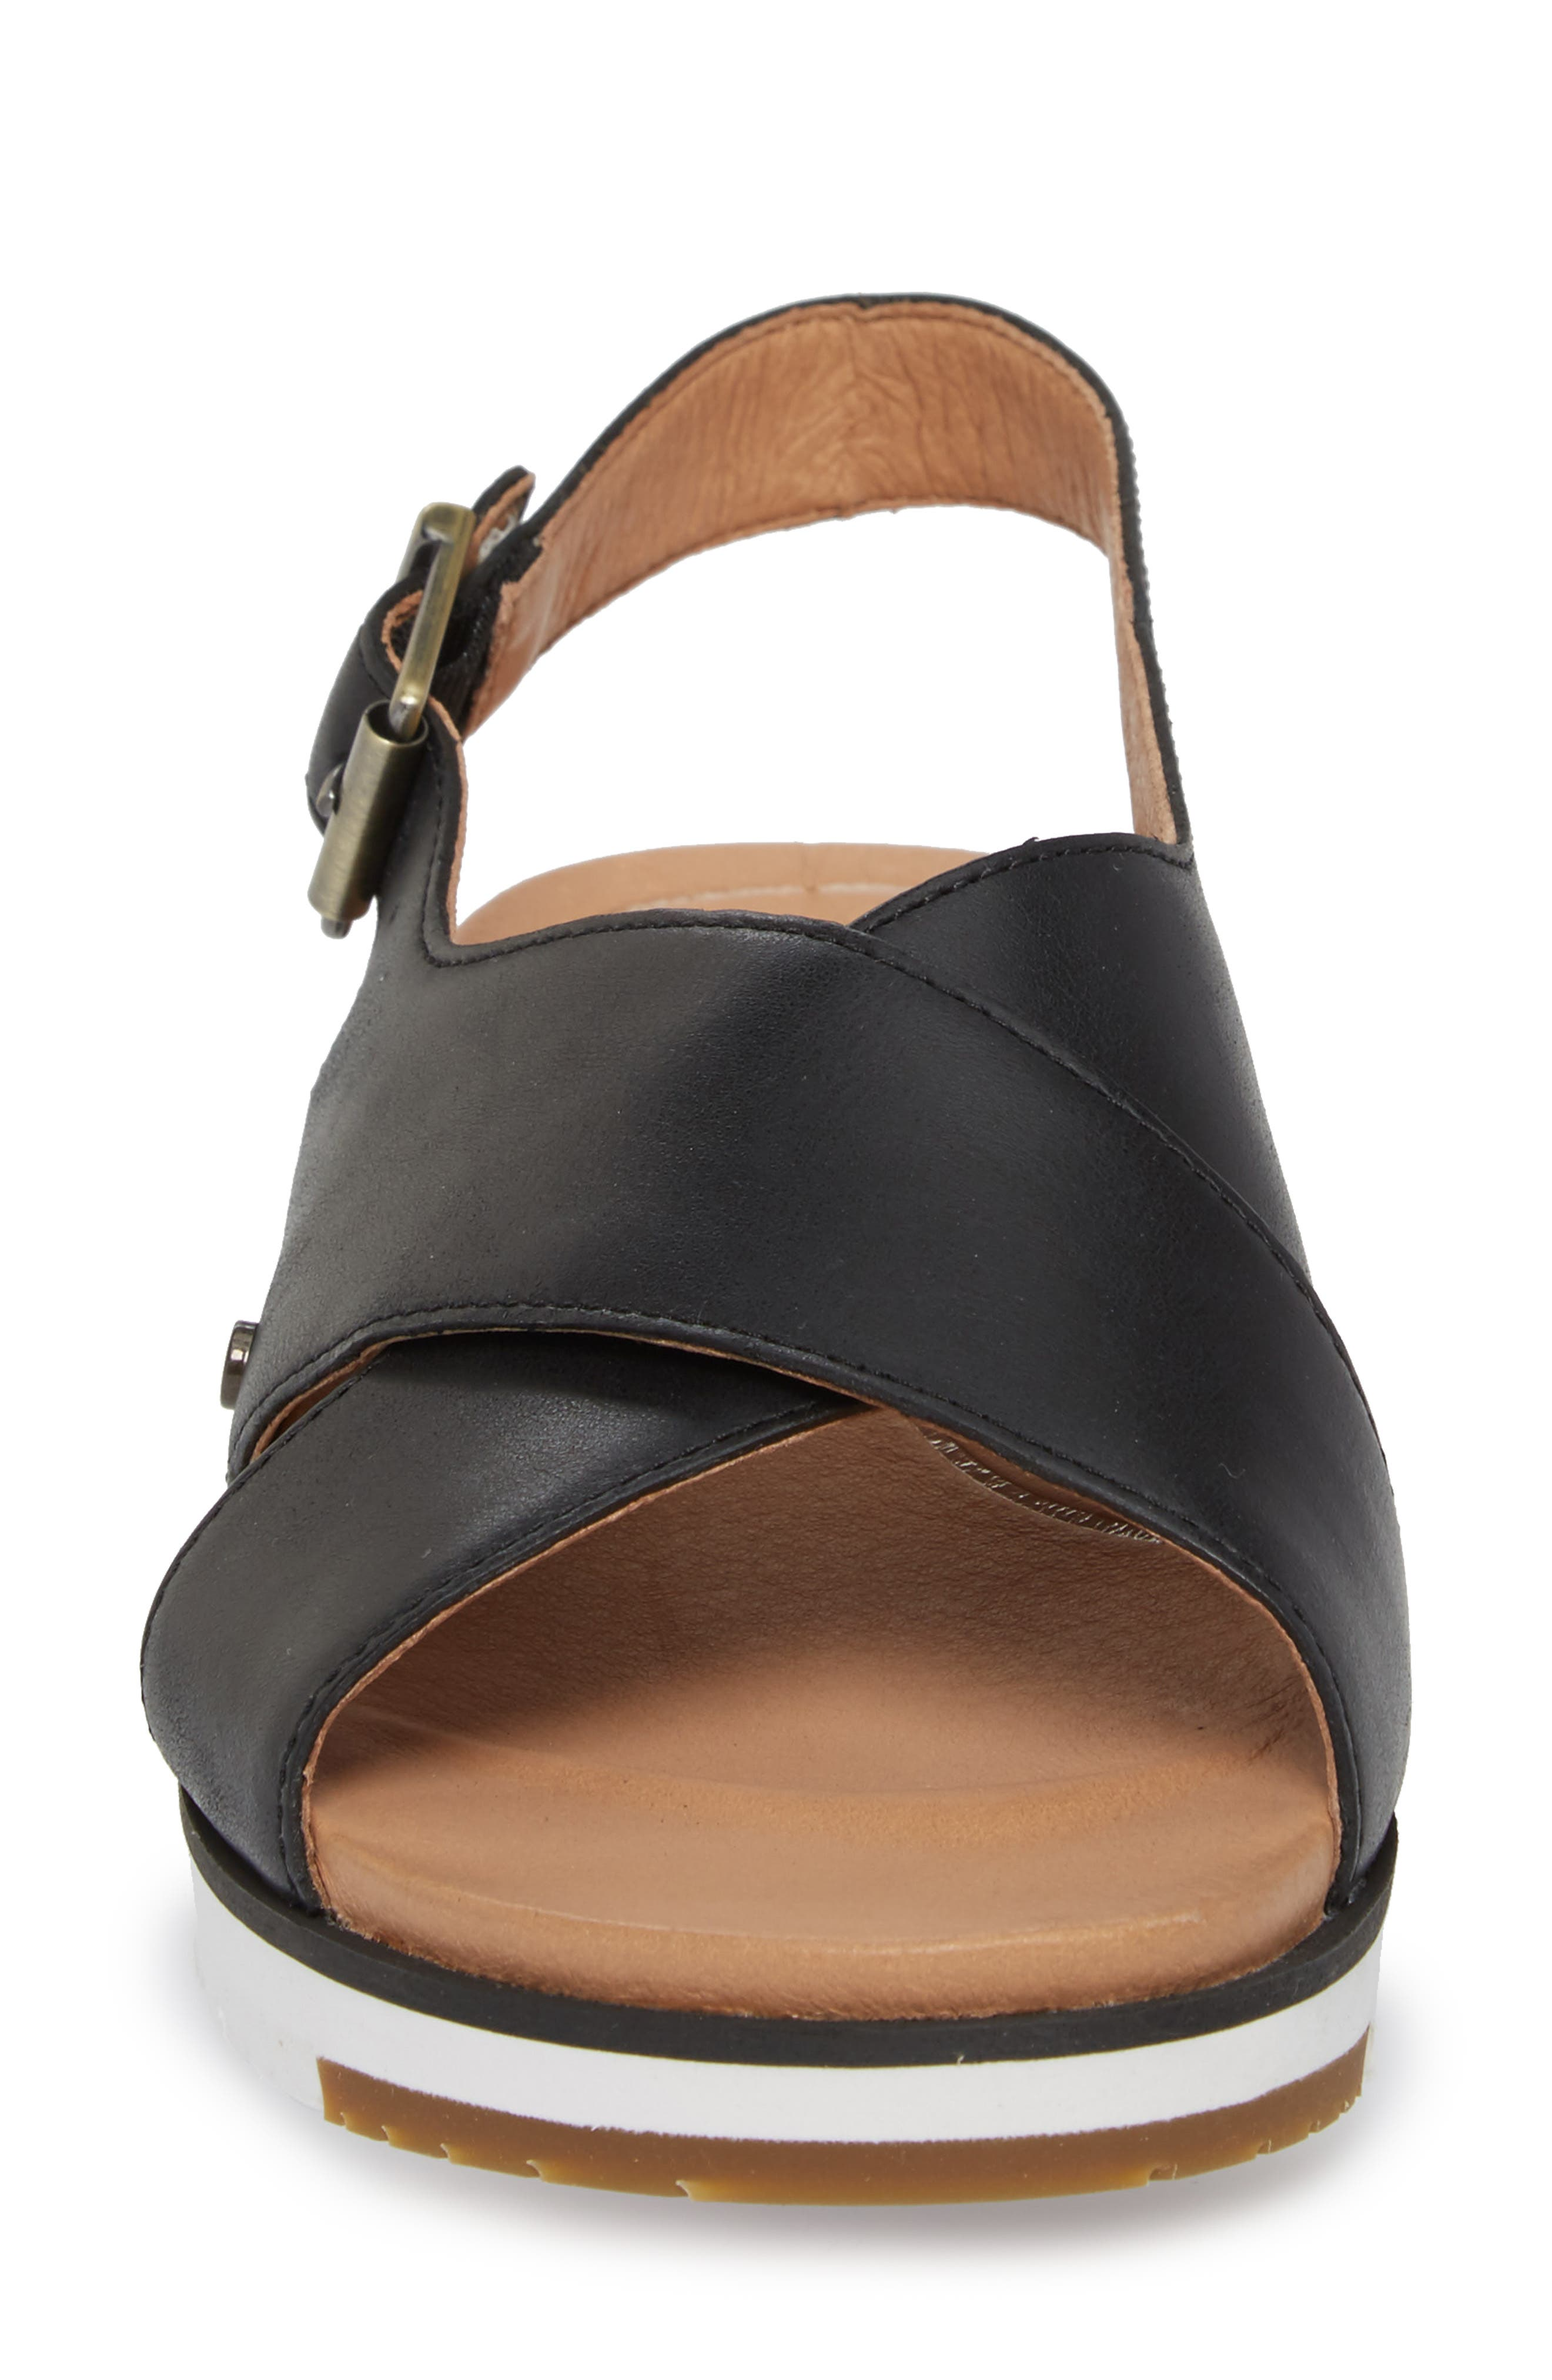 Kamile Sandal,                             Alternate thumbnail 4, color,                             Black Leather